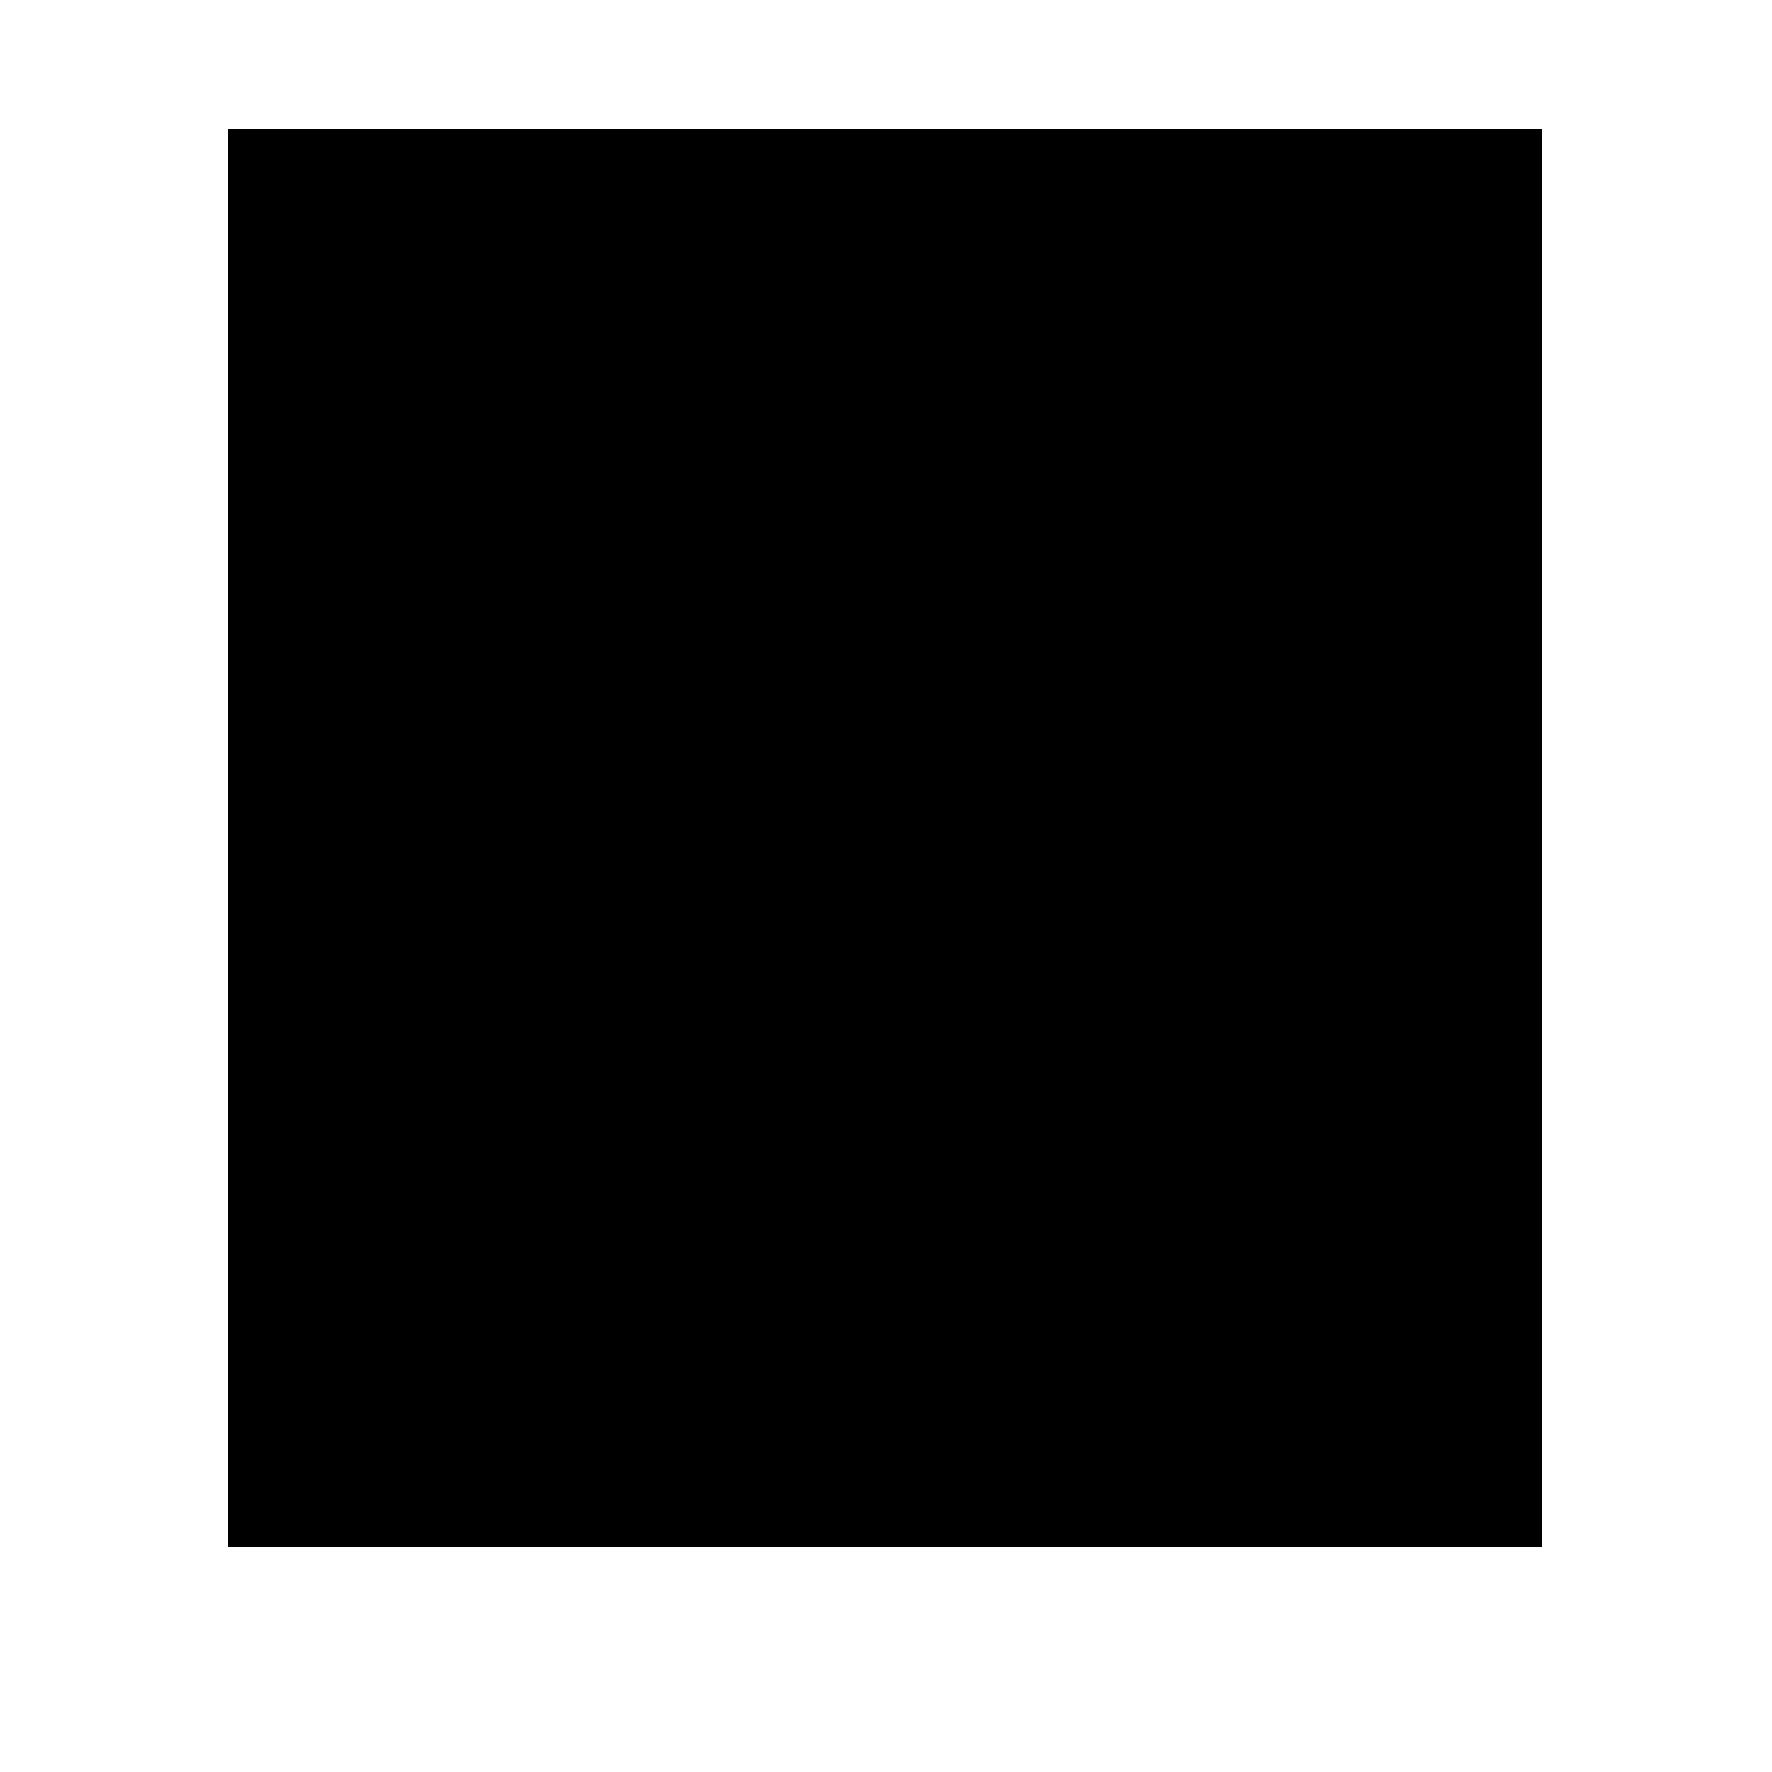 Escagnan